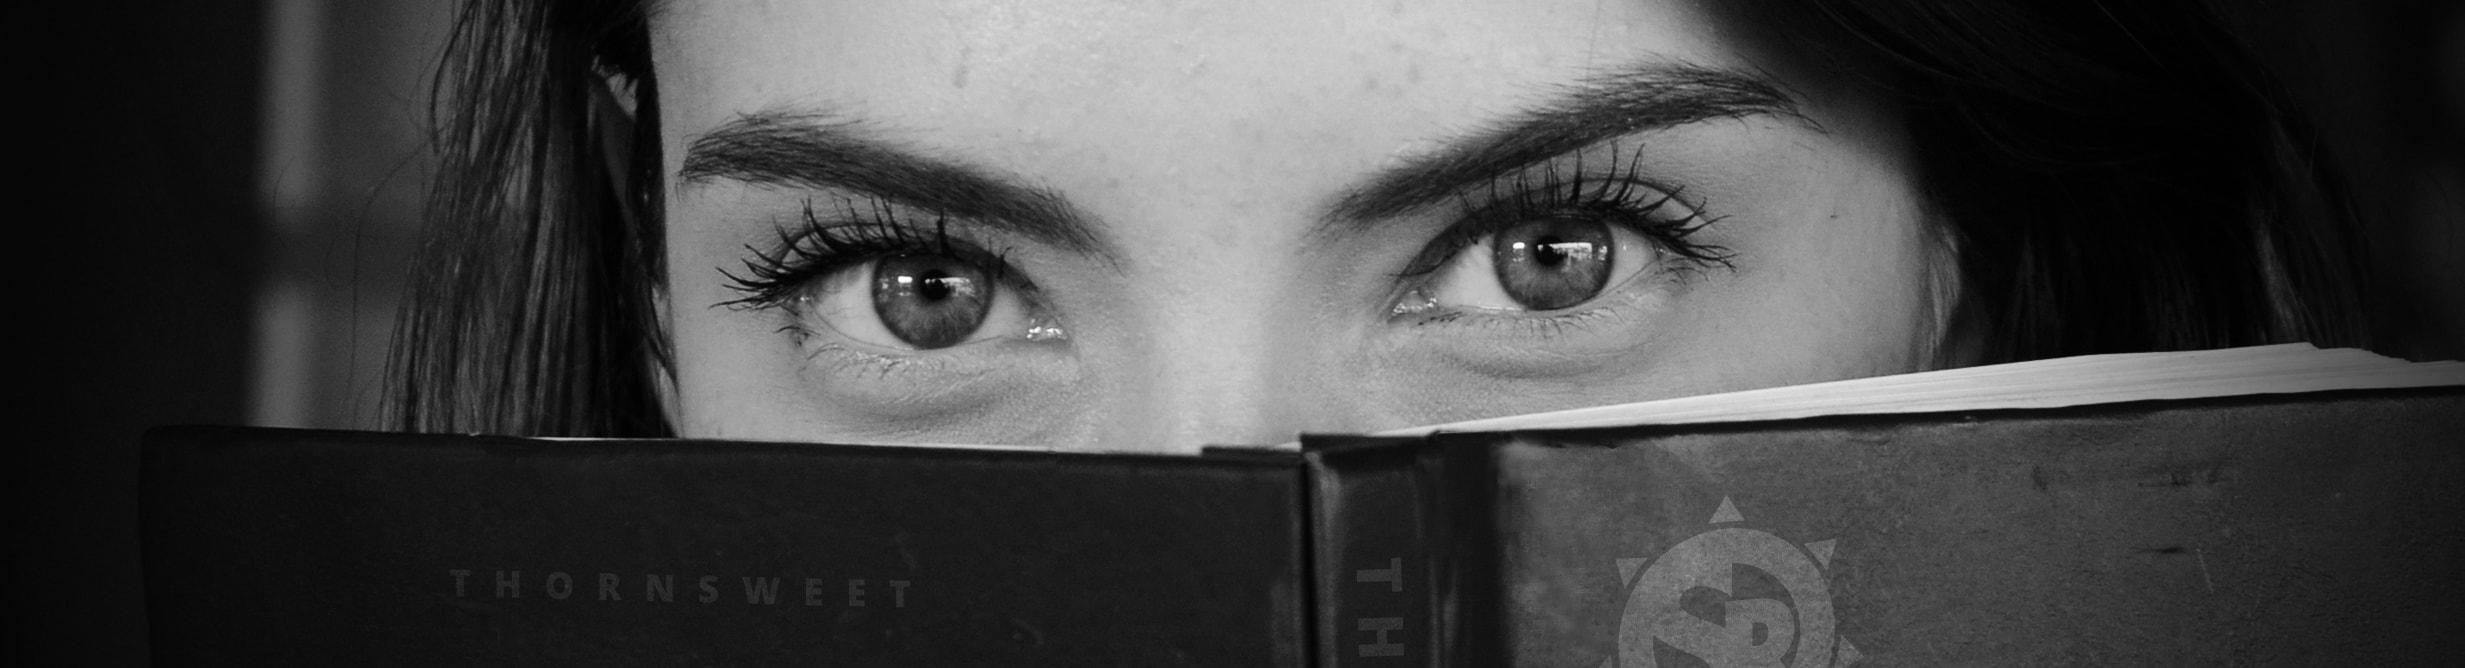 Learn More. Solsticio, Rebelde and Company. Books for Badass Girls